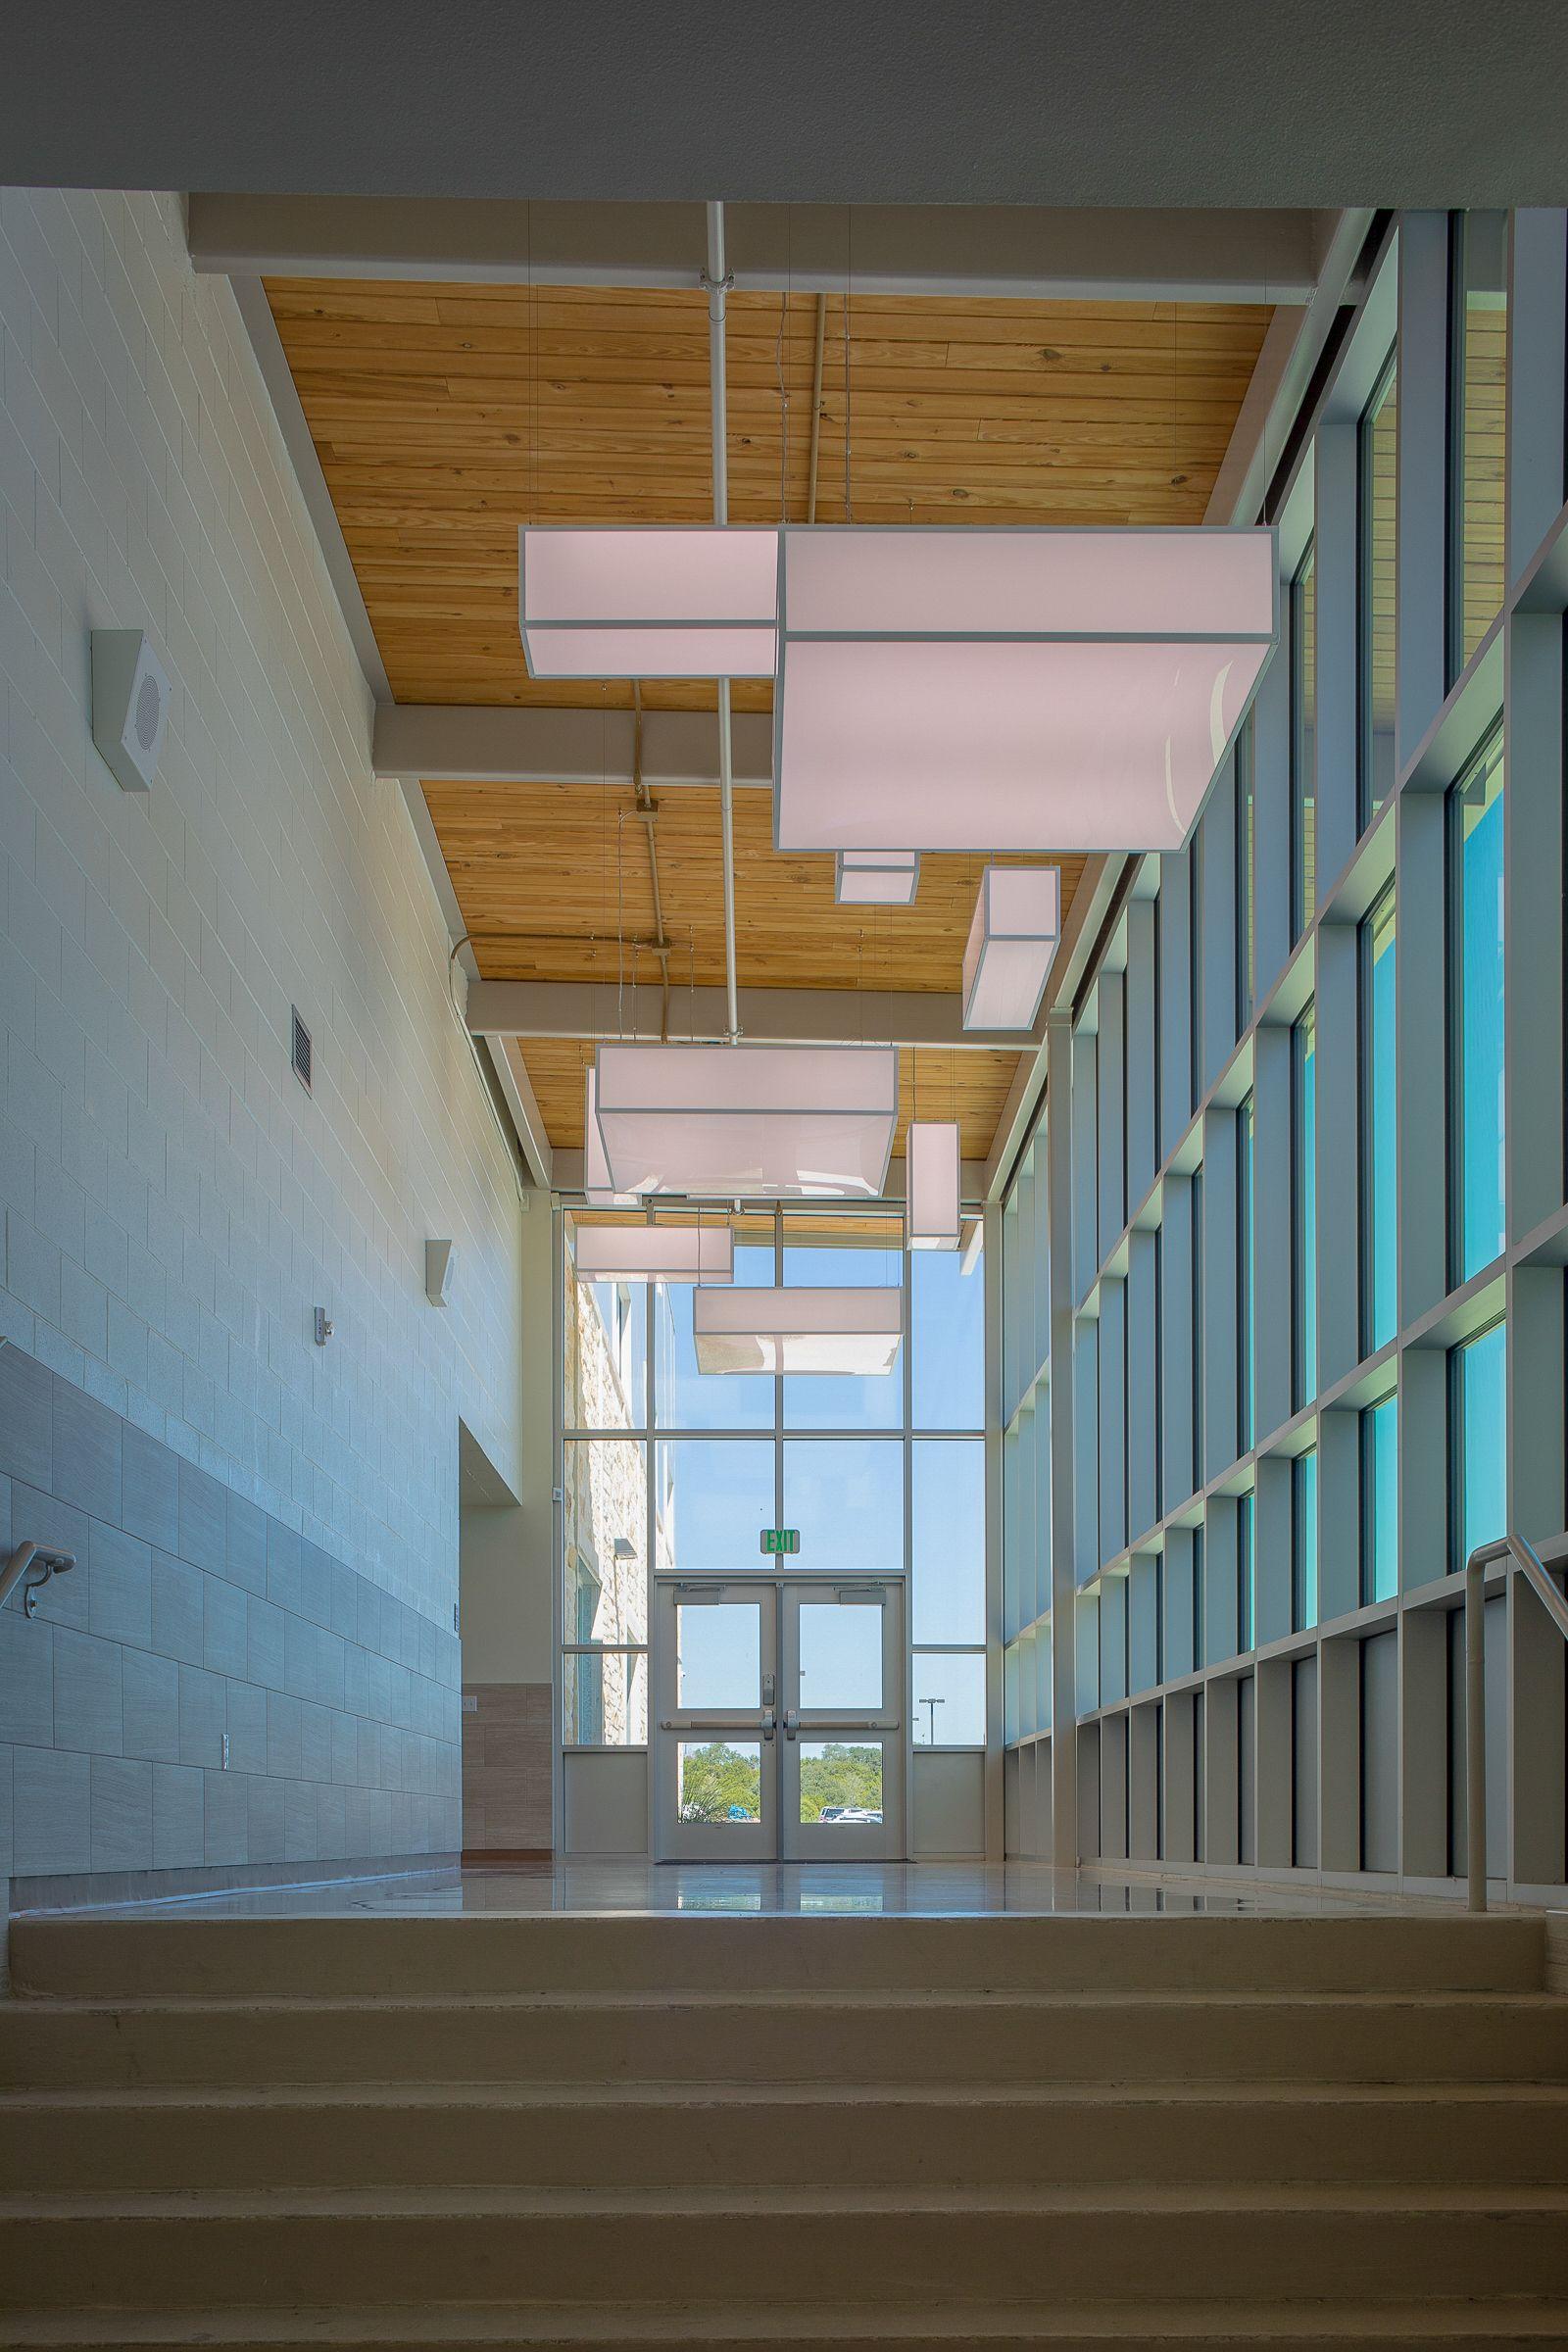 Corridor Glazing Windows Lighting Architecture Design